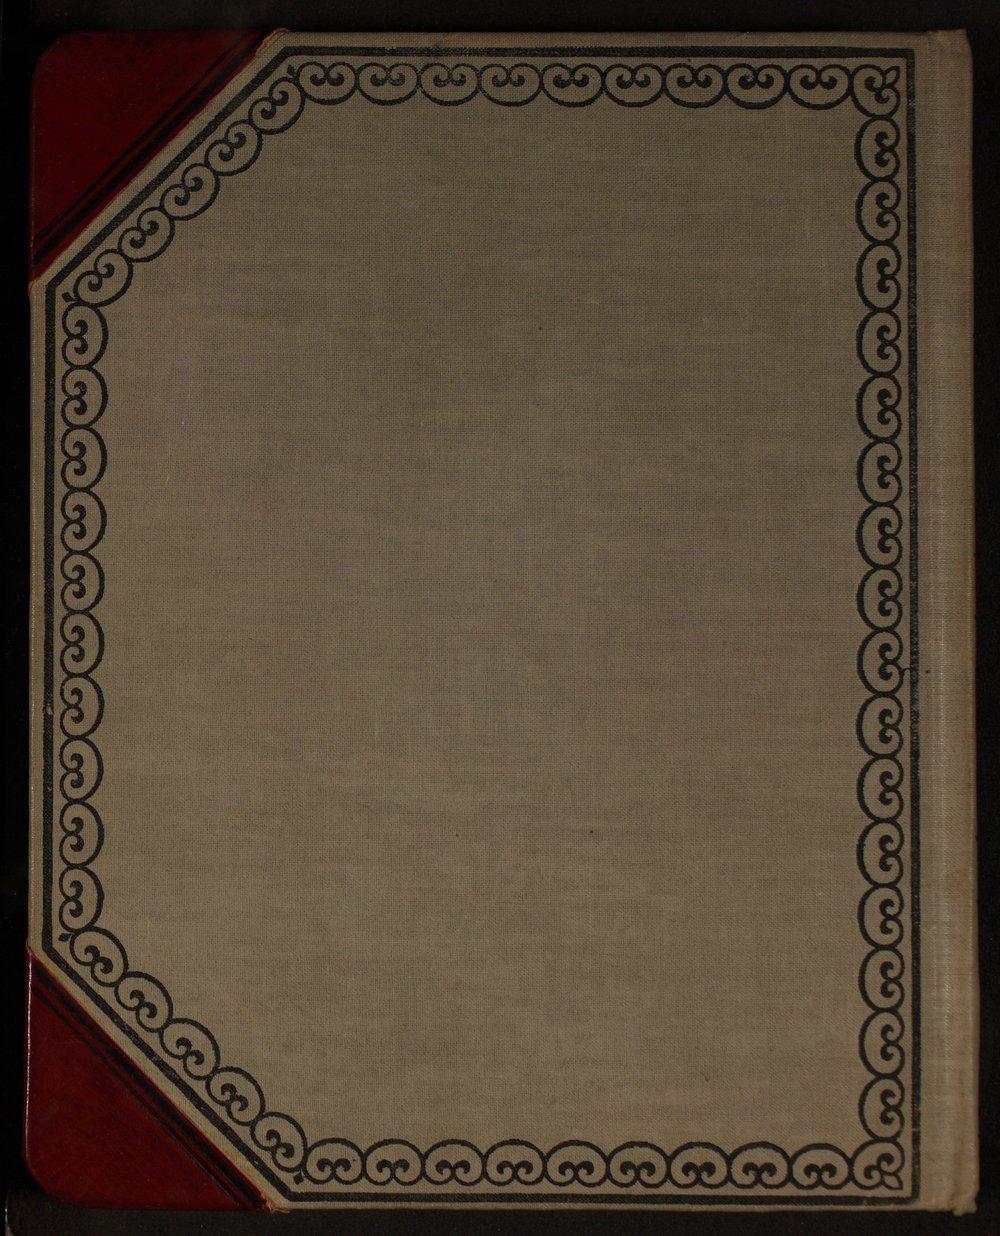 Martha Farnsworth diary - [Back cover]